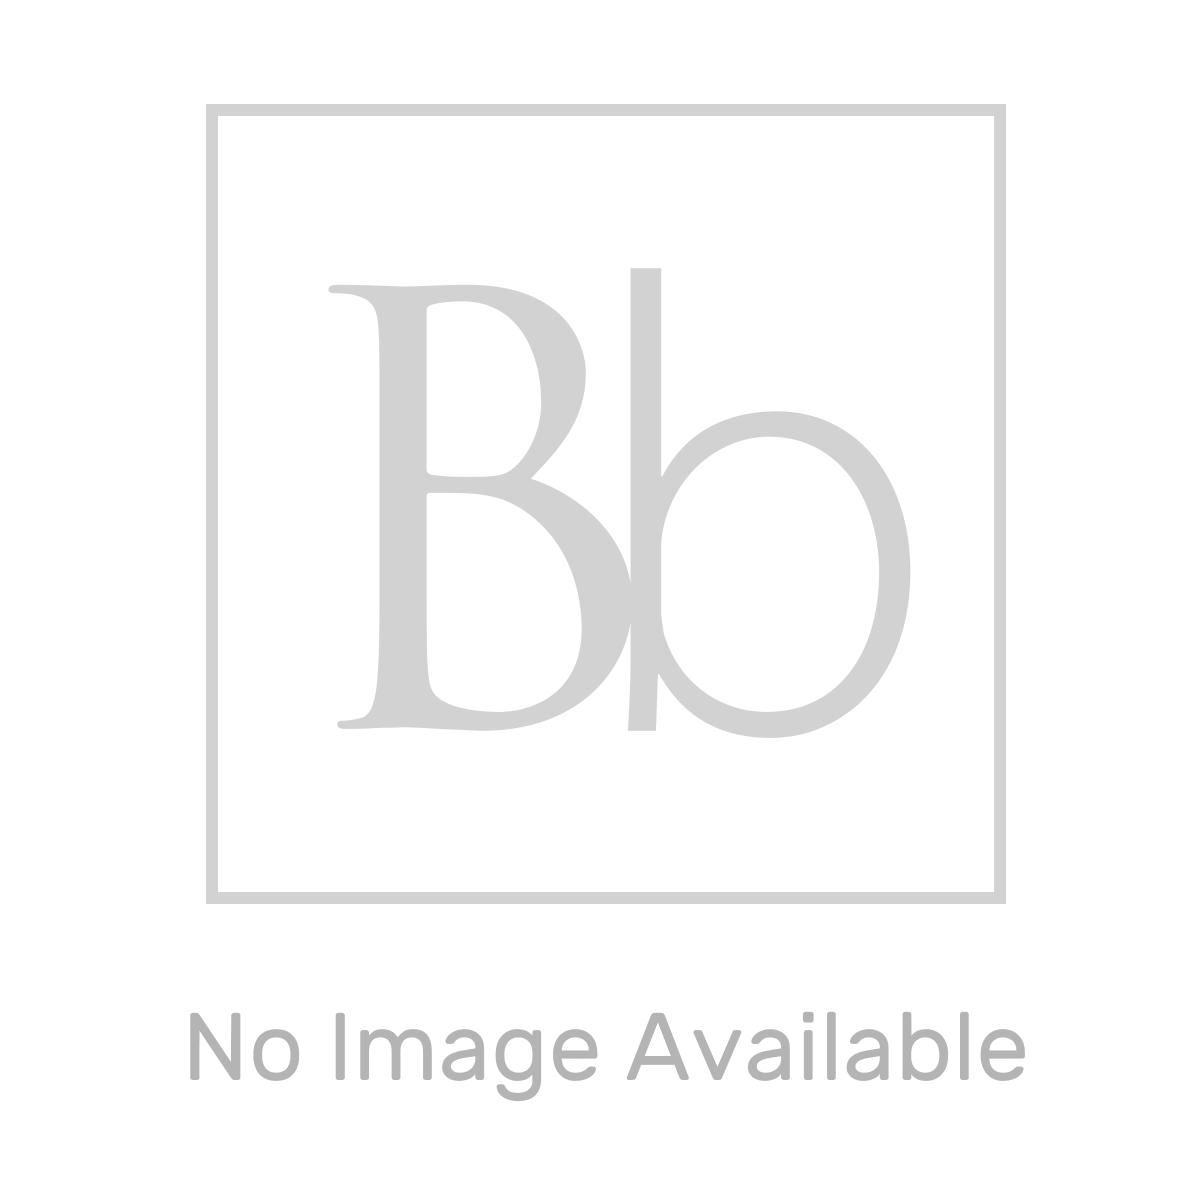 April Rectangular Anti Slip Shower Tray Measurements 1100 x 800